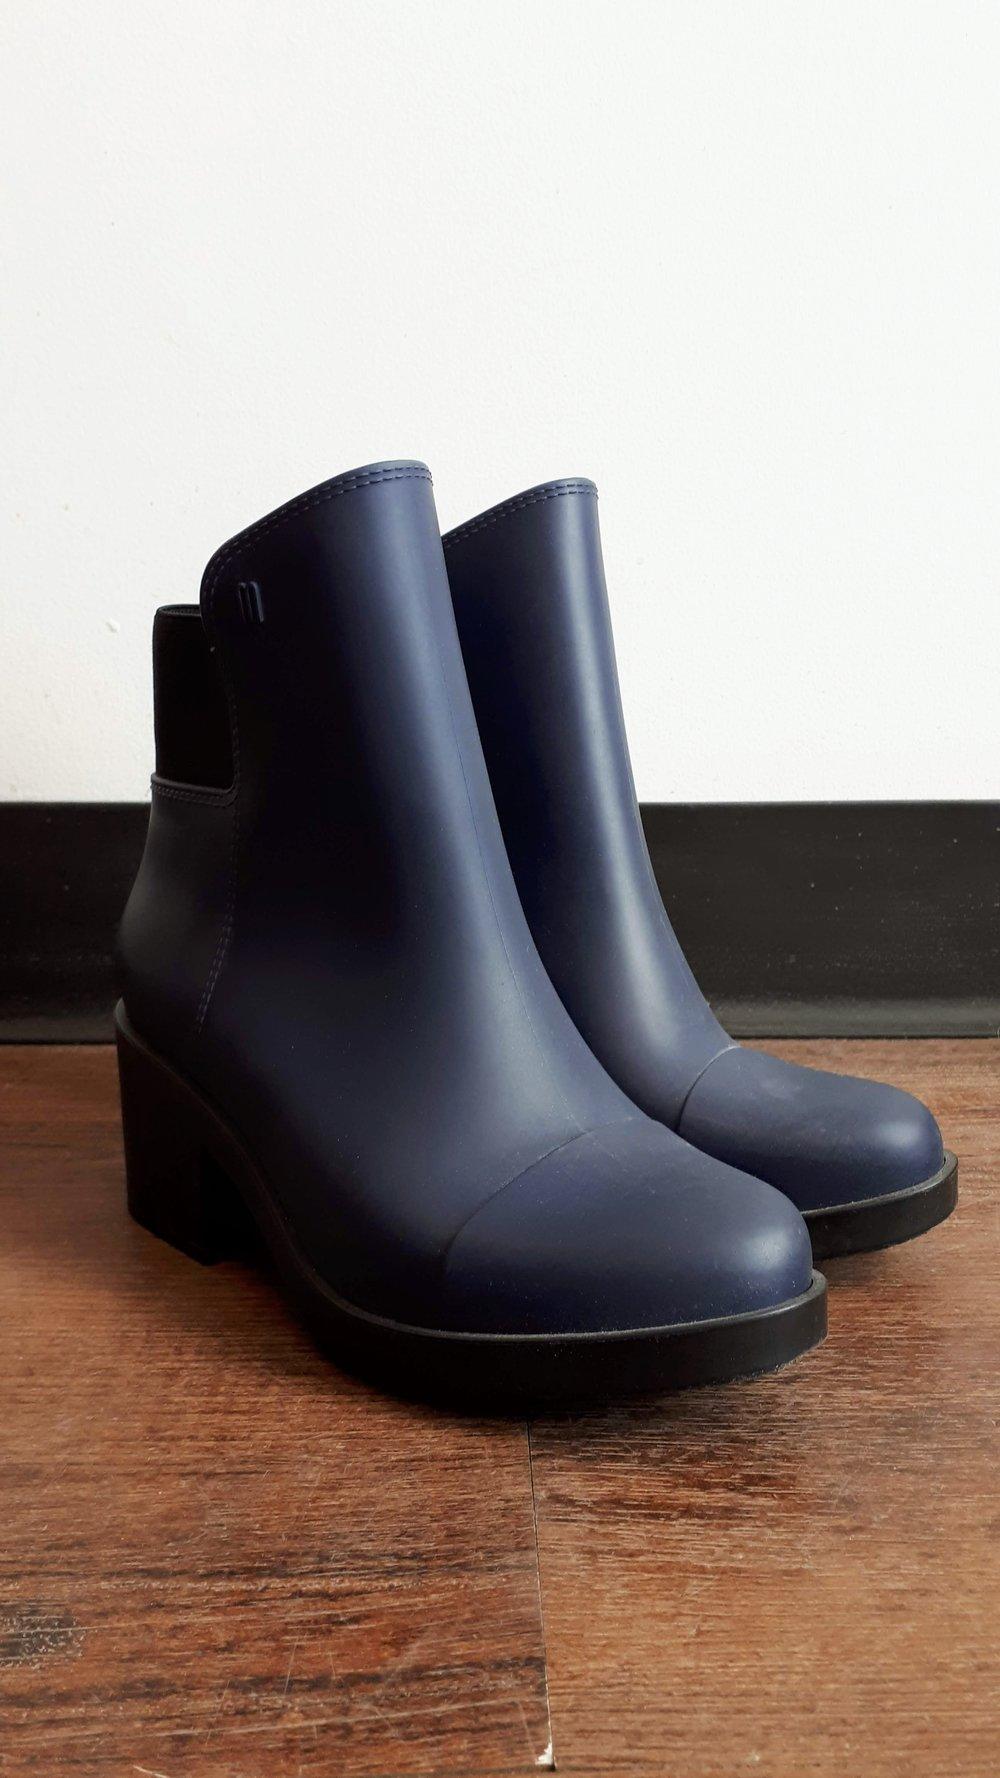 Melissa boots; S7, $42